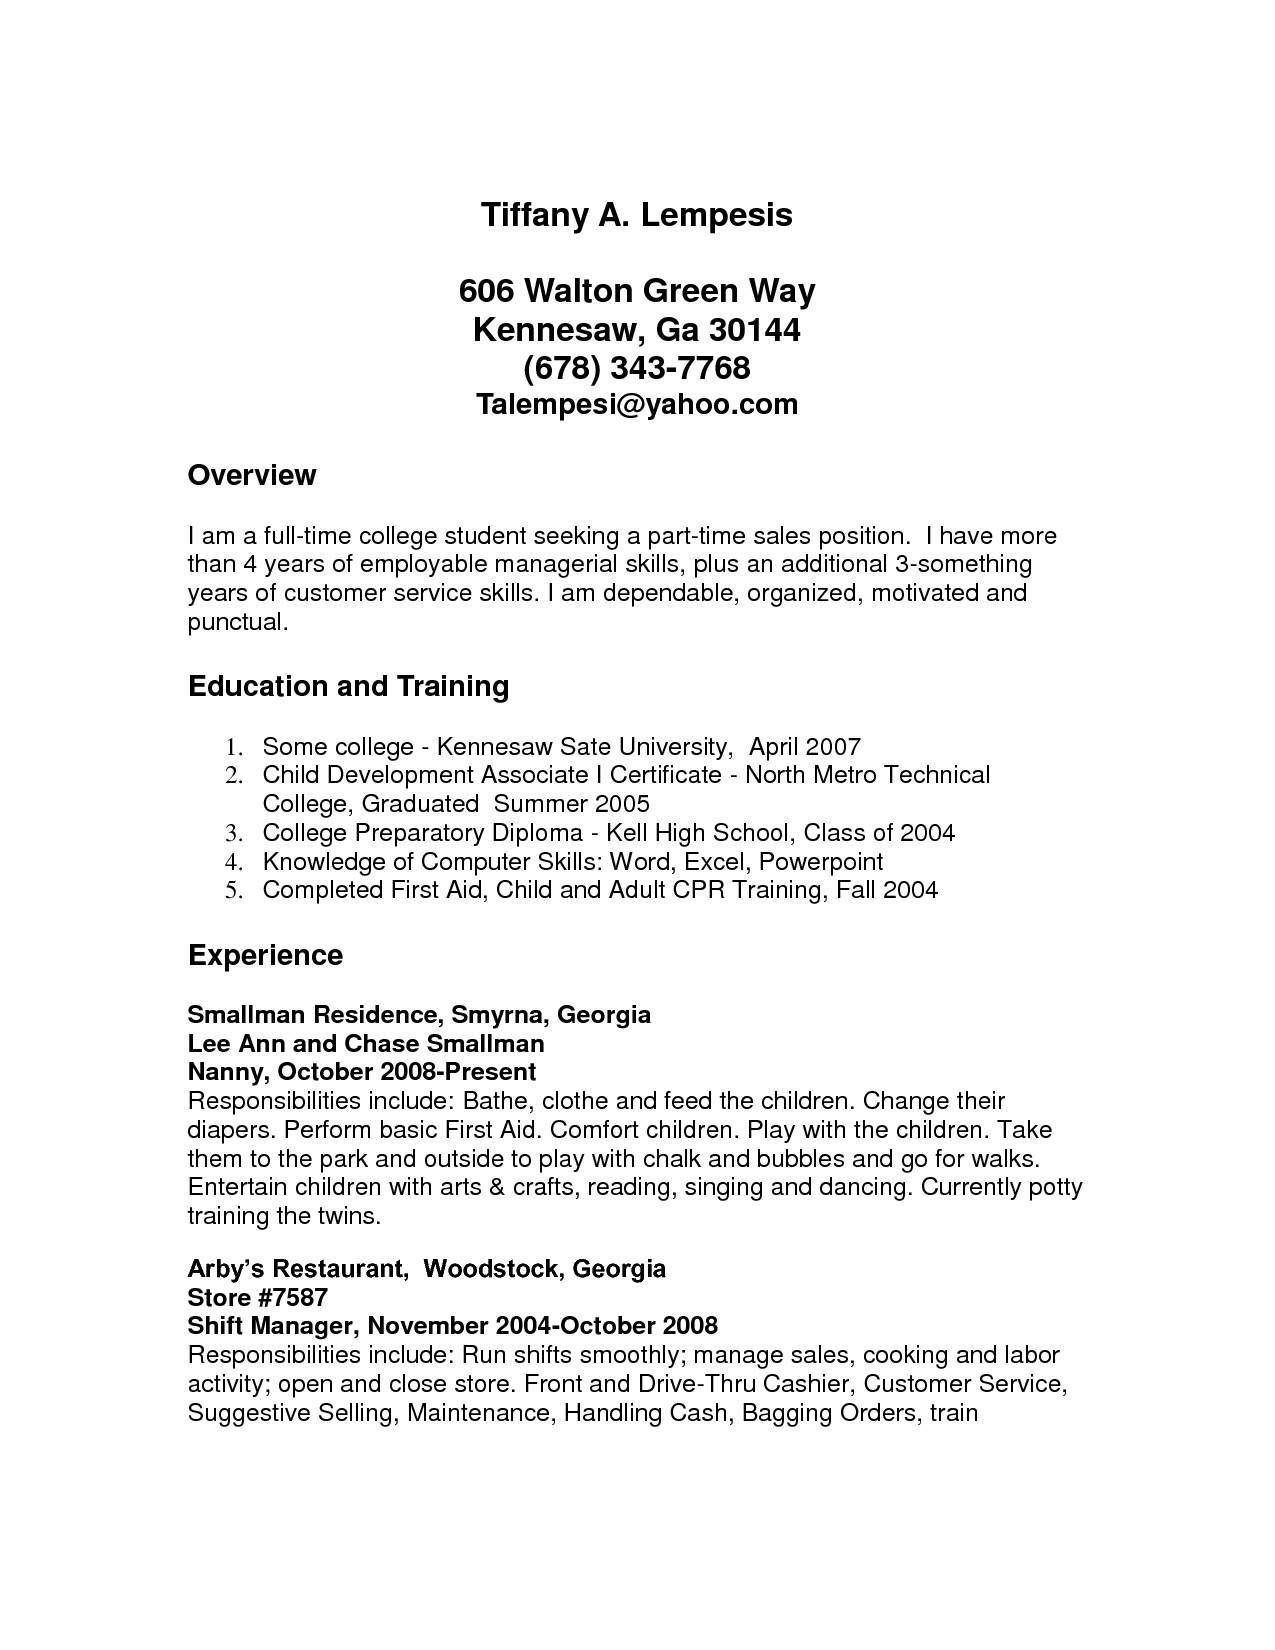 parttime job resume